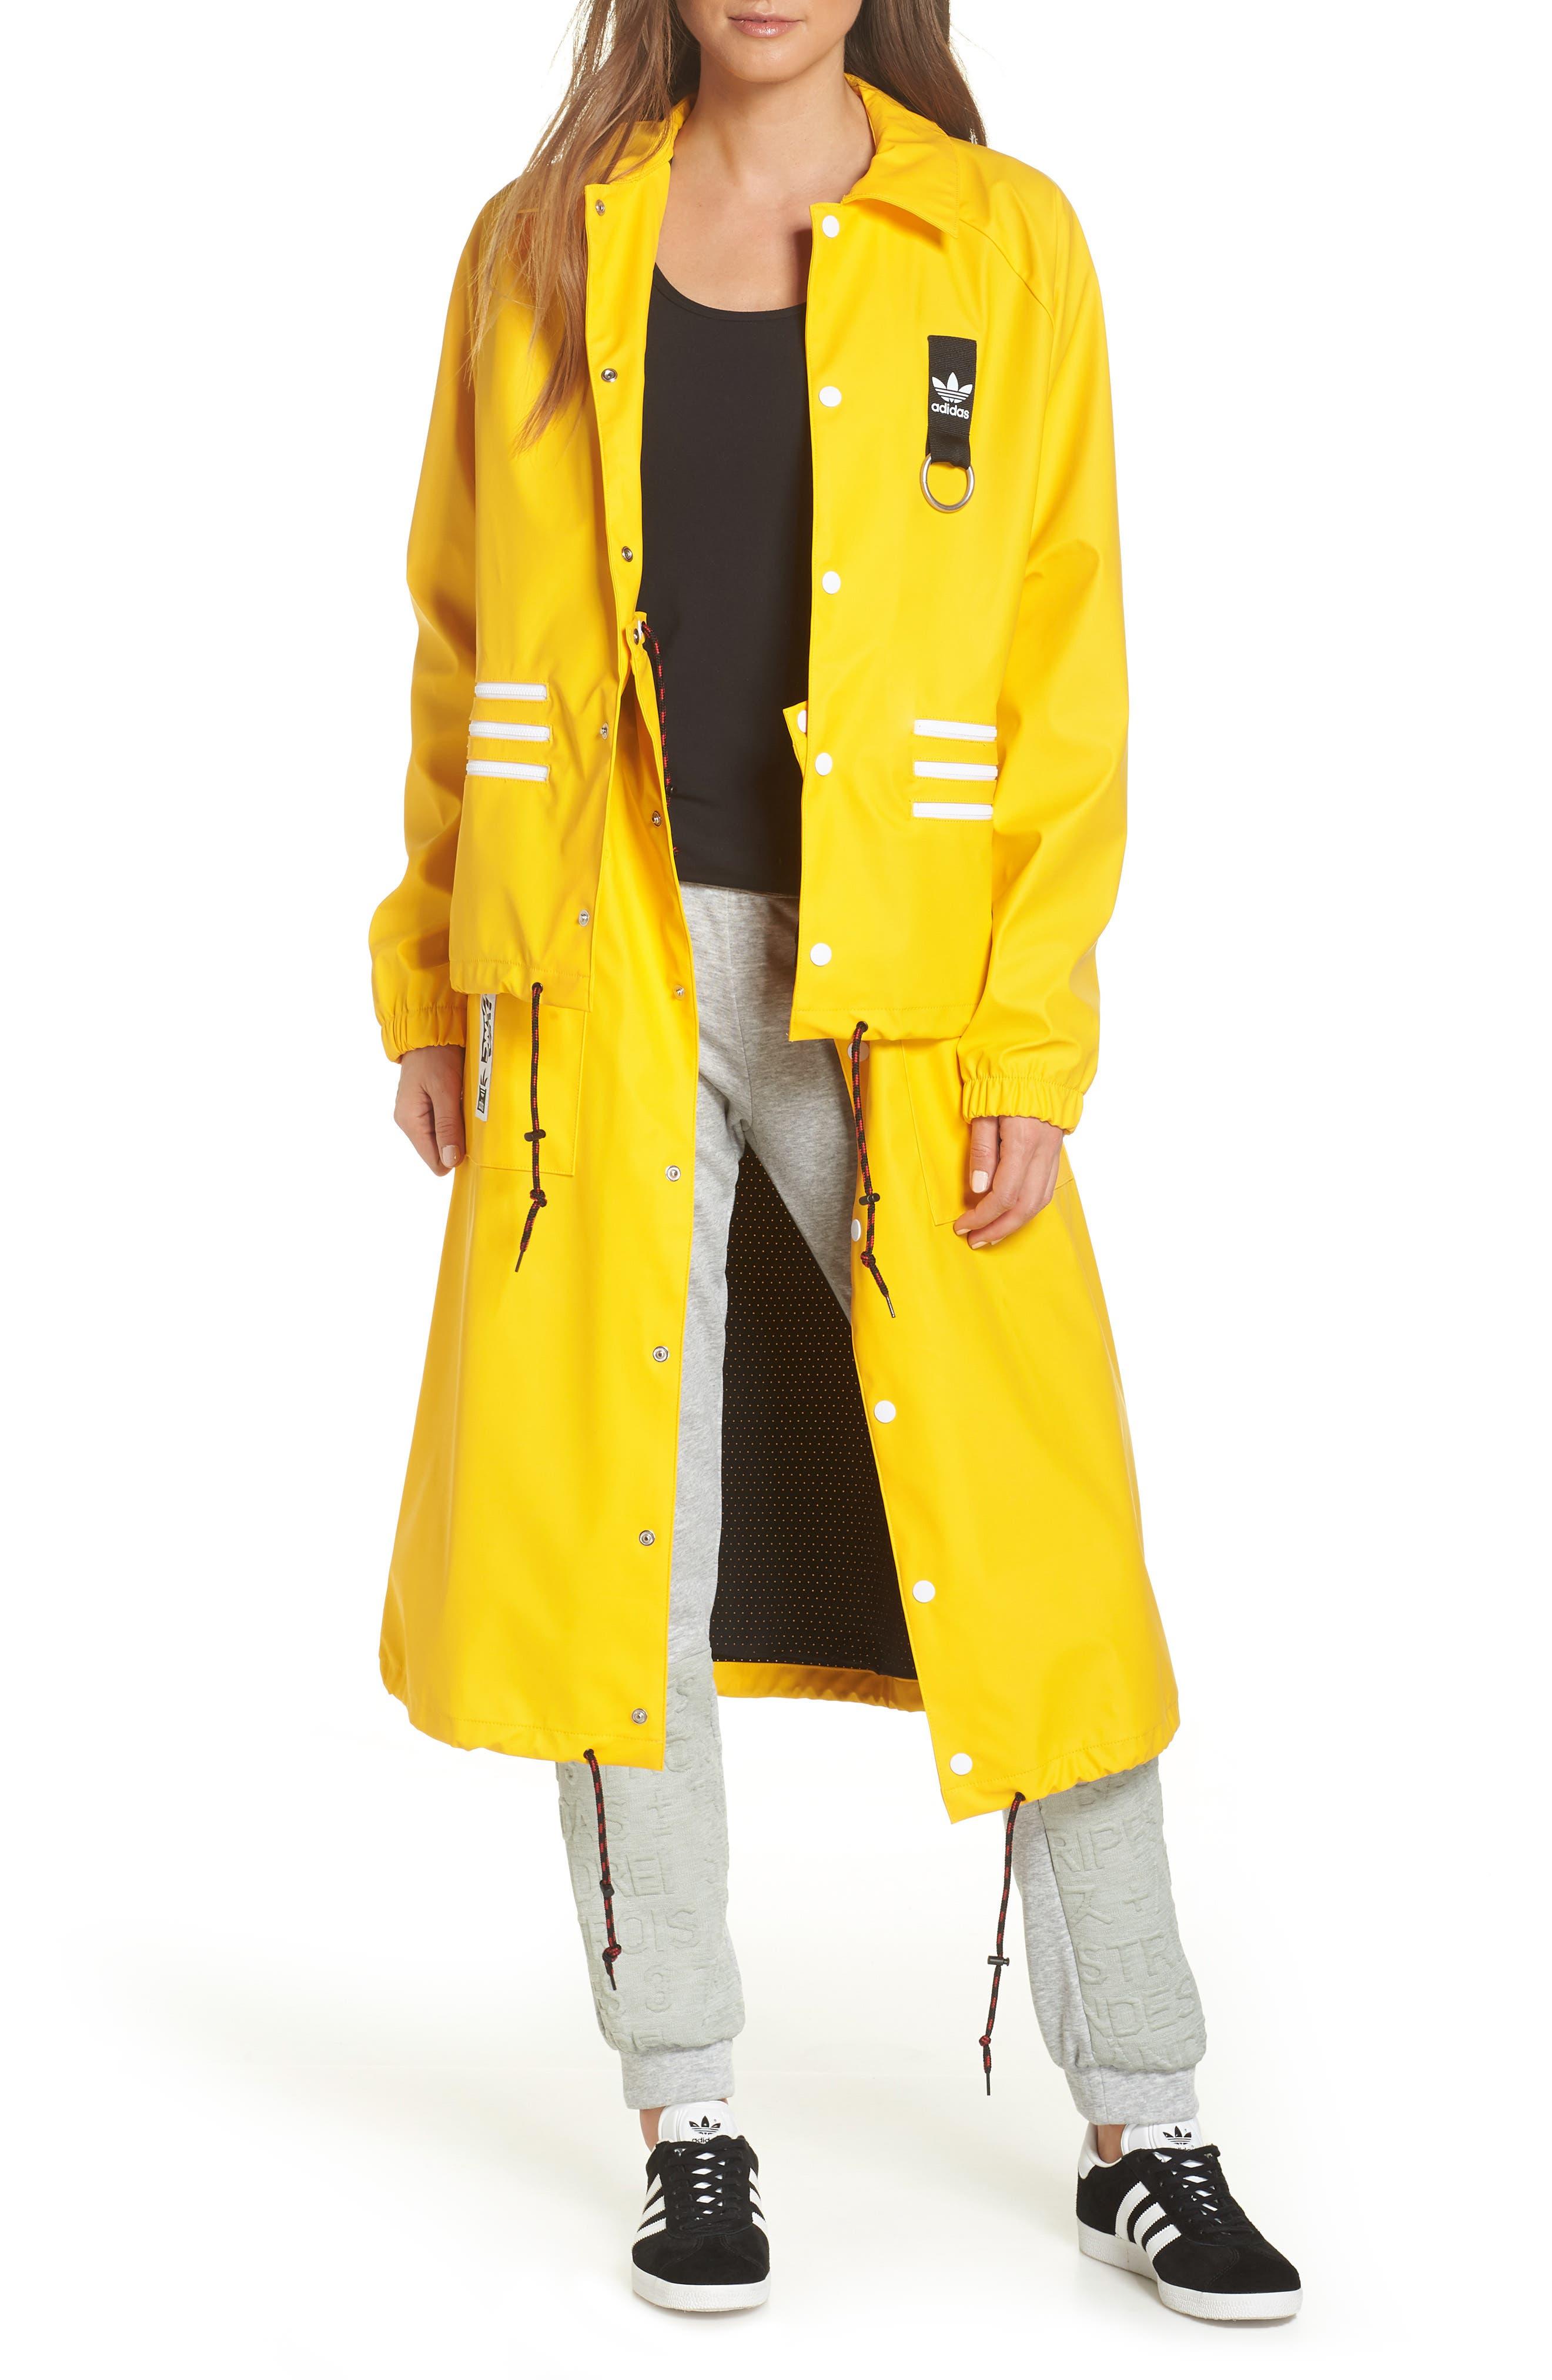 Adidas Originals X Olivia Oblanc Convertible Trench Coat, Yellow